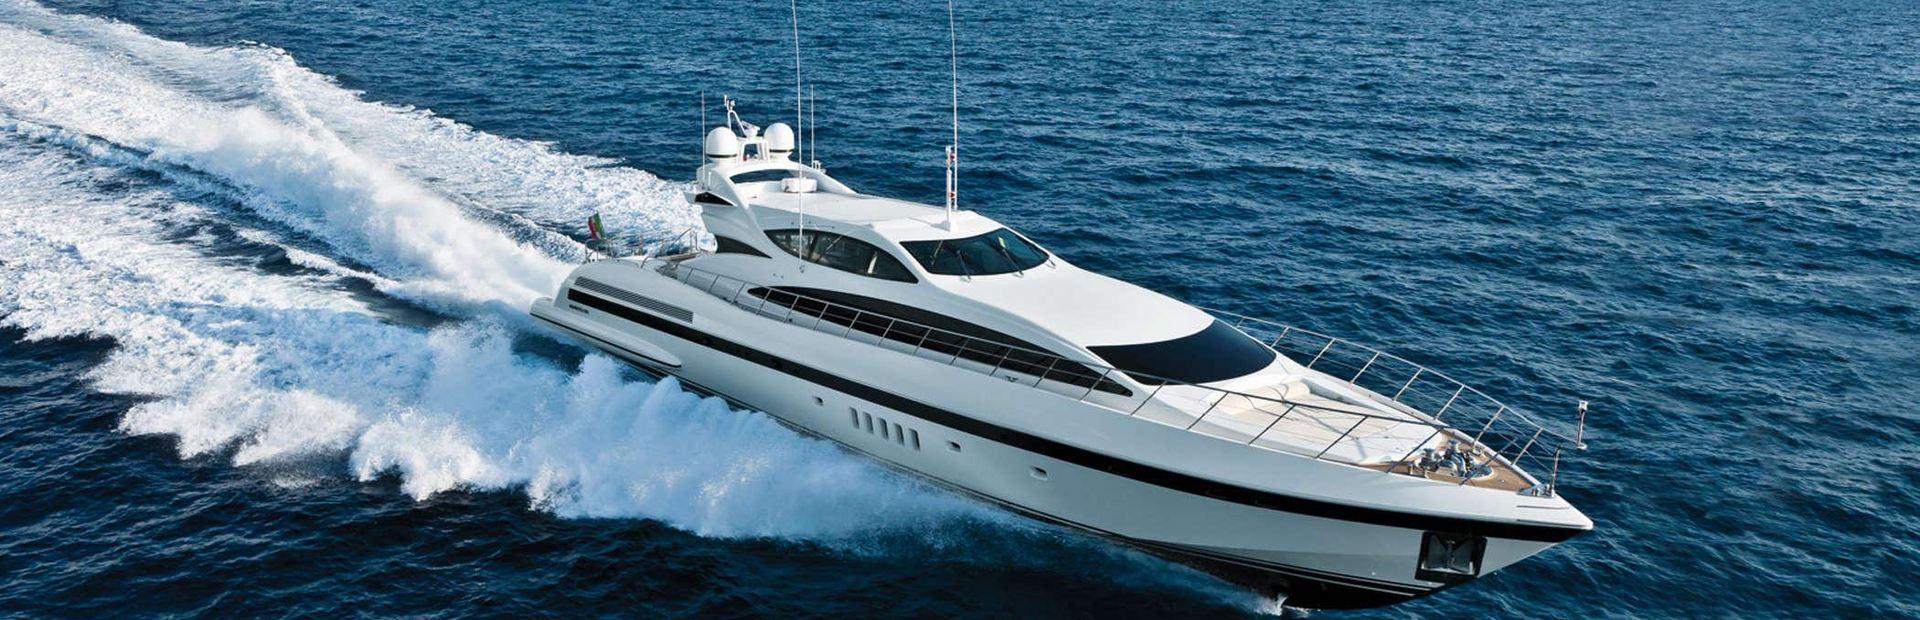 Mangusta 105 Yacht Charter